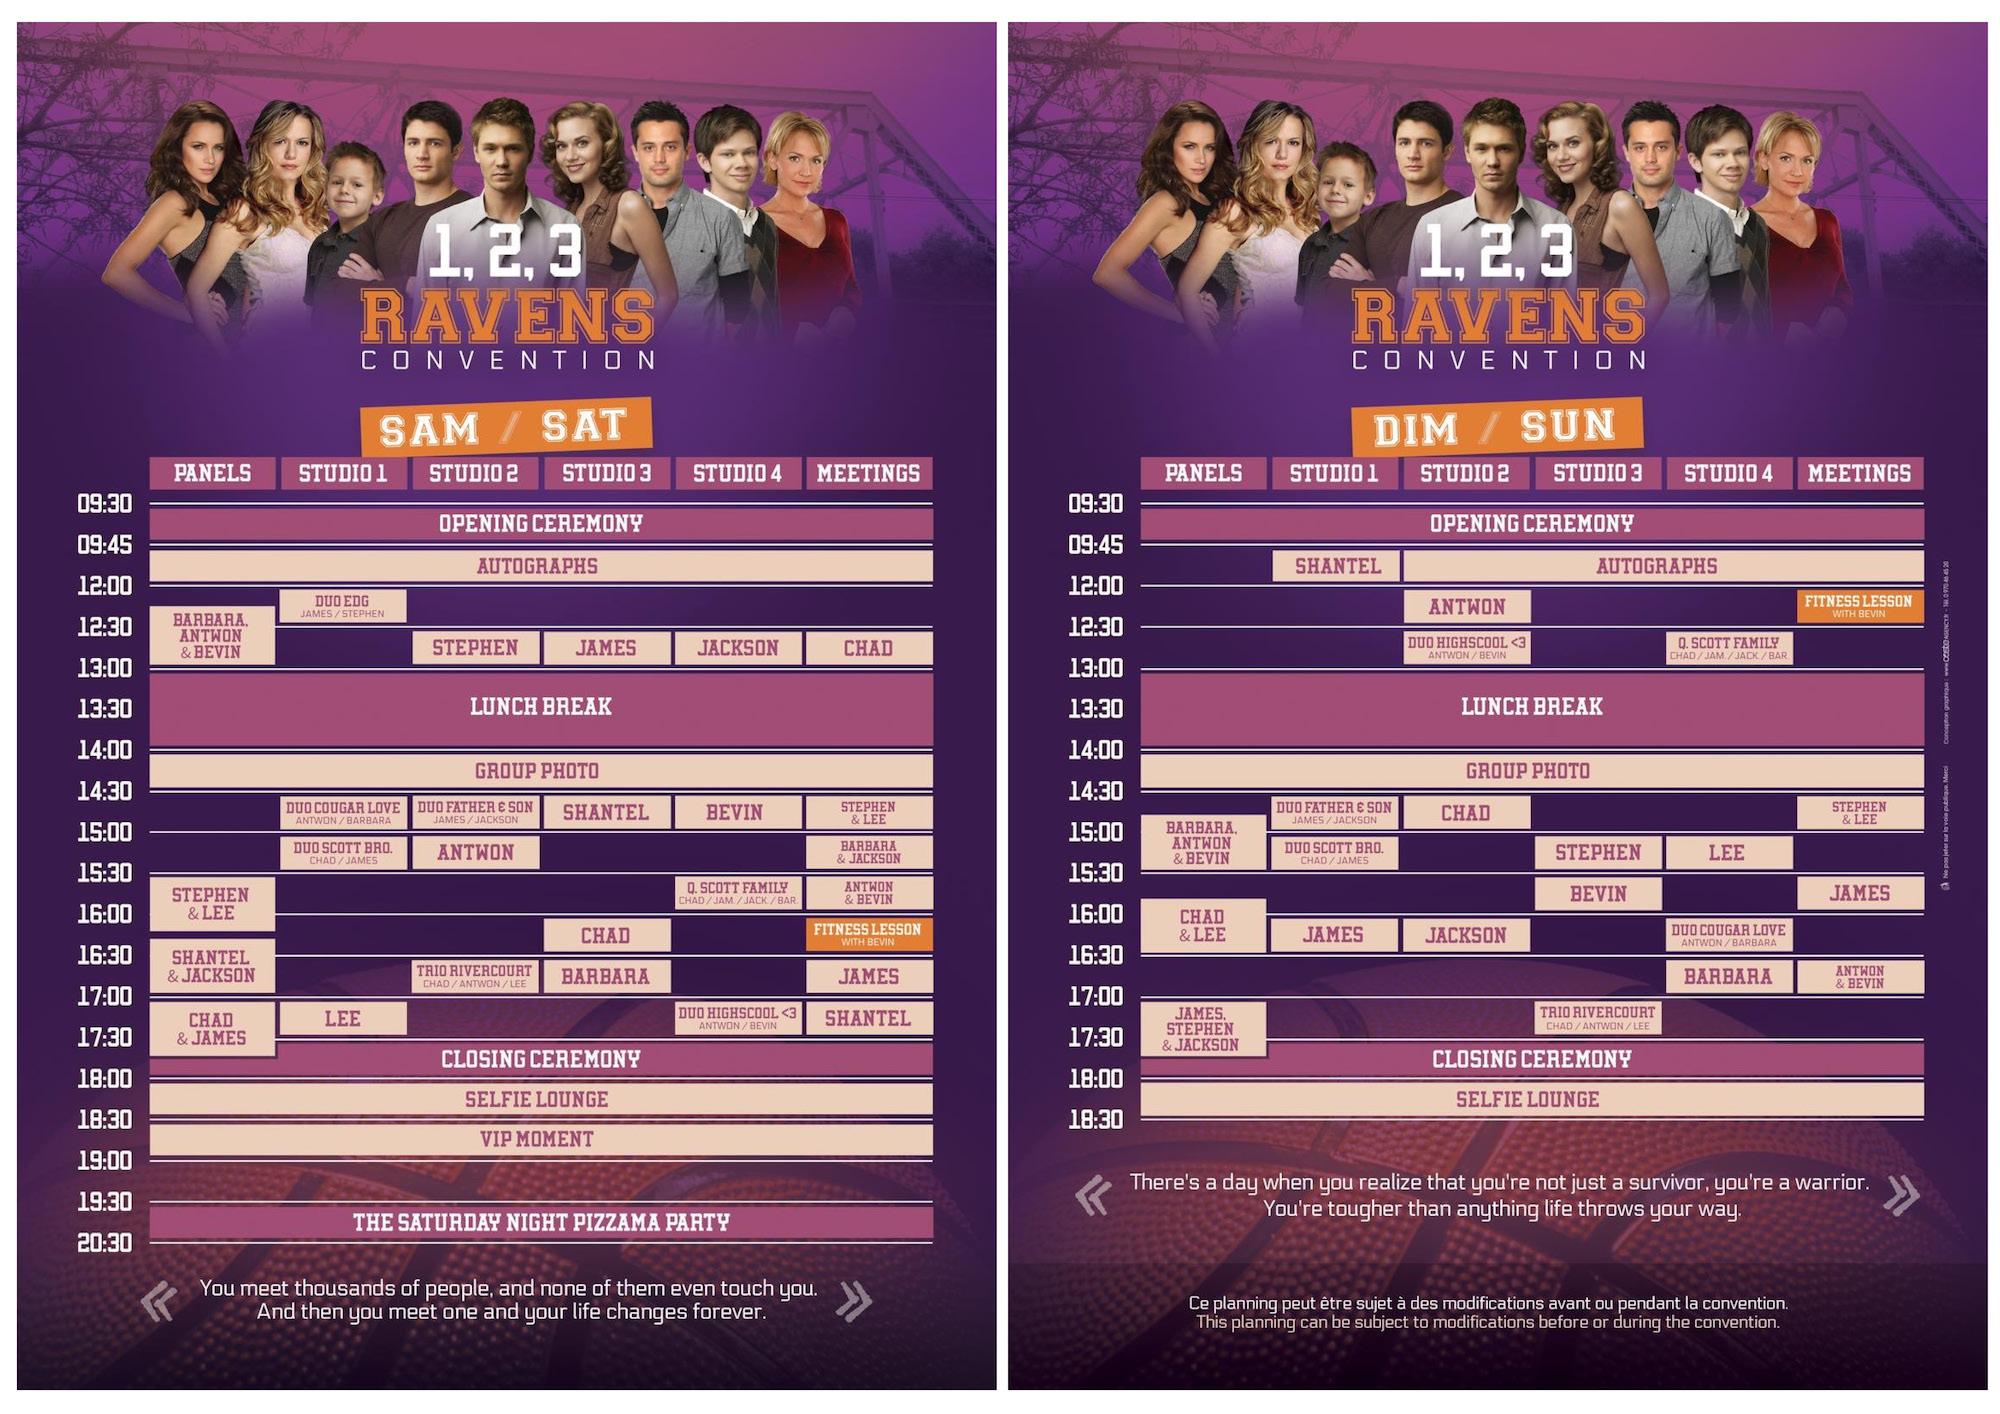 Convention OTH - 1, 2, 3, Ravens programme